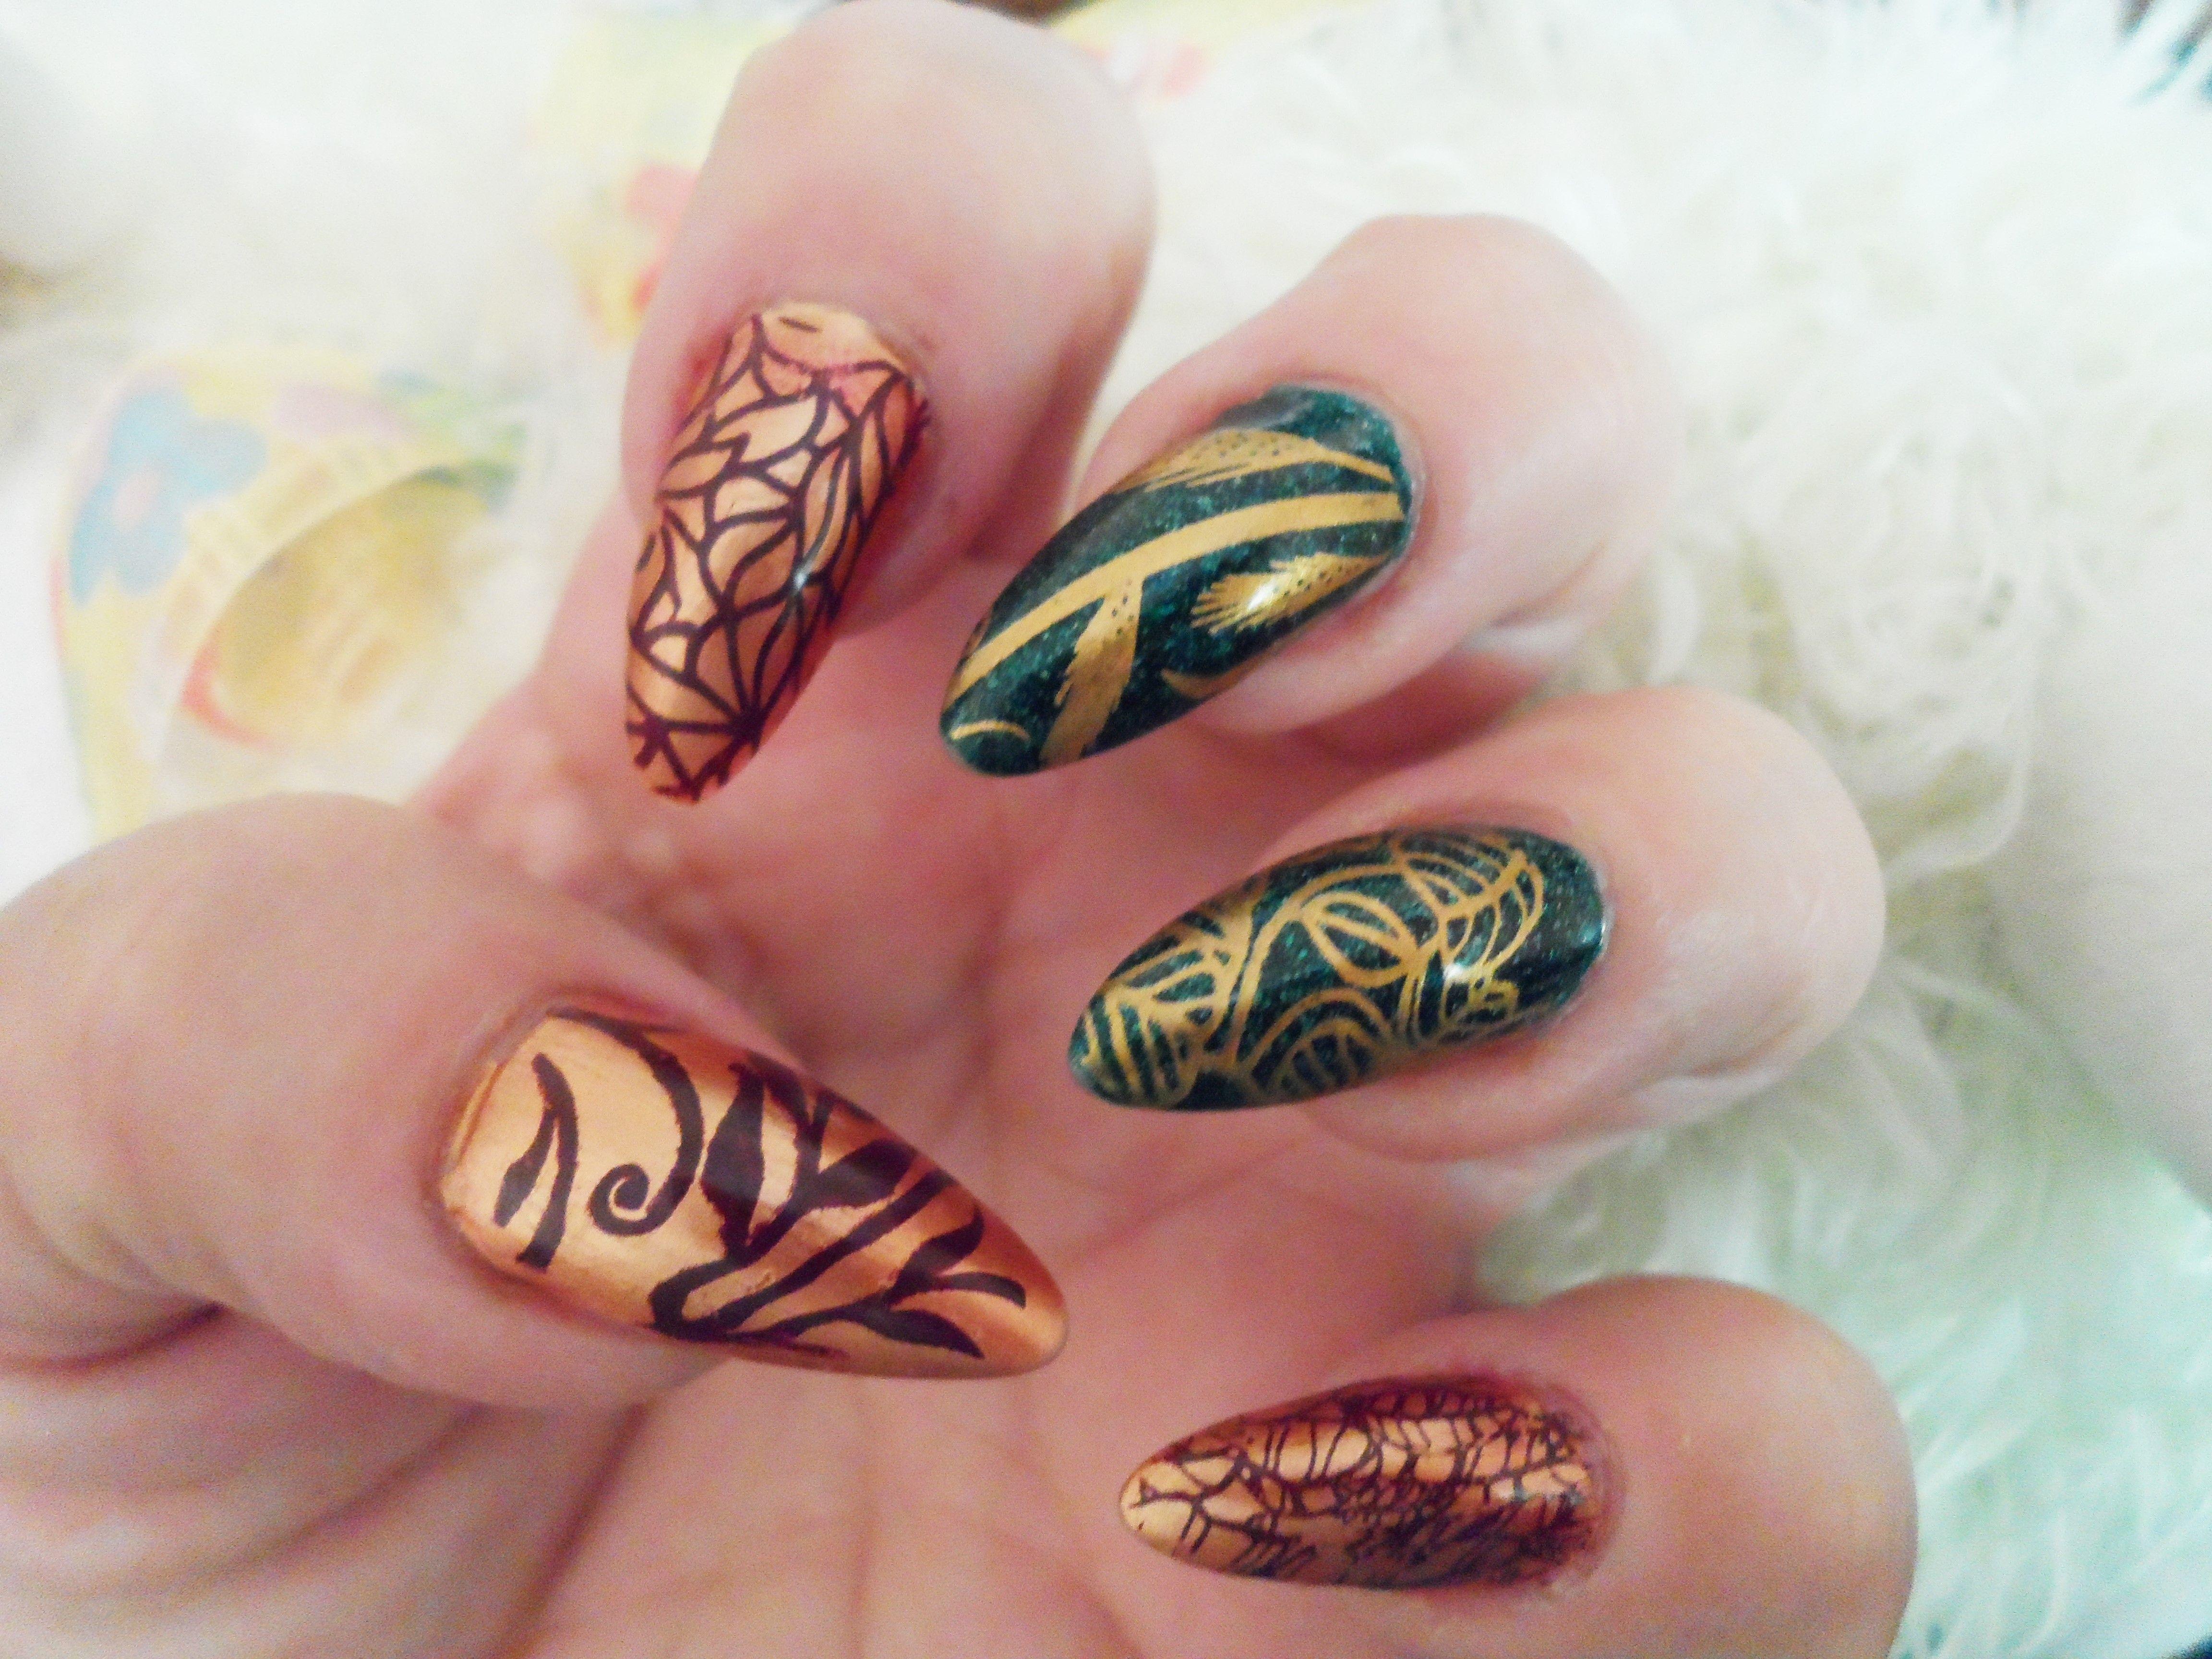 Autumn nails by Rita Korn, Hair Affair, Fort Wayne, IN | Expensive ...